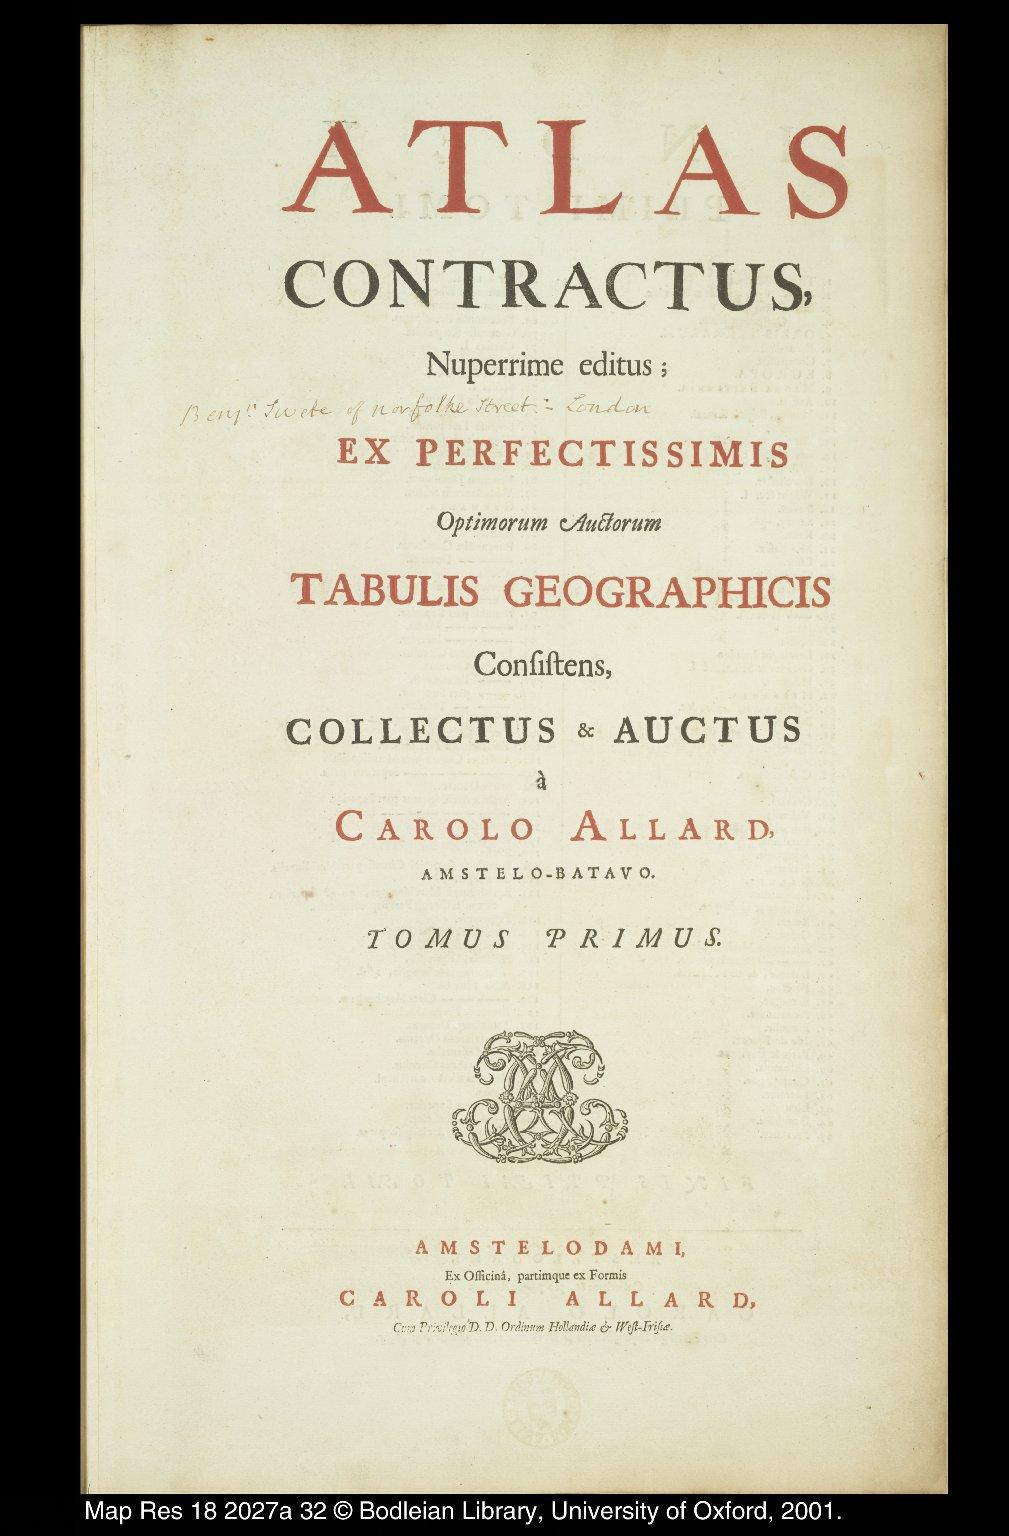 Atlas Contractus, Nuperrime editus ; [...] [1 of 1]